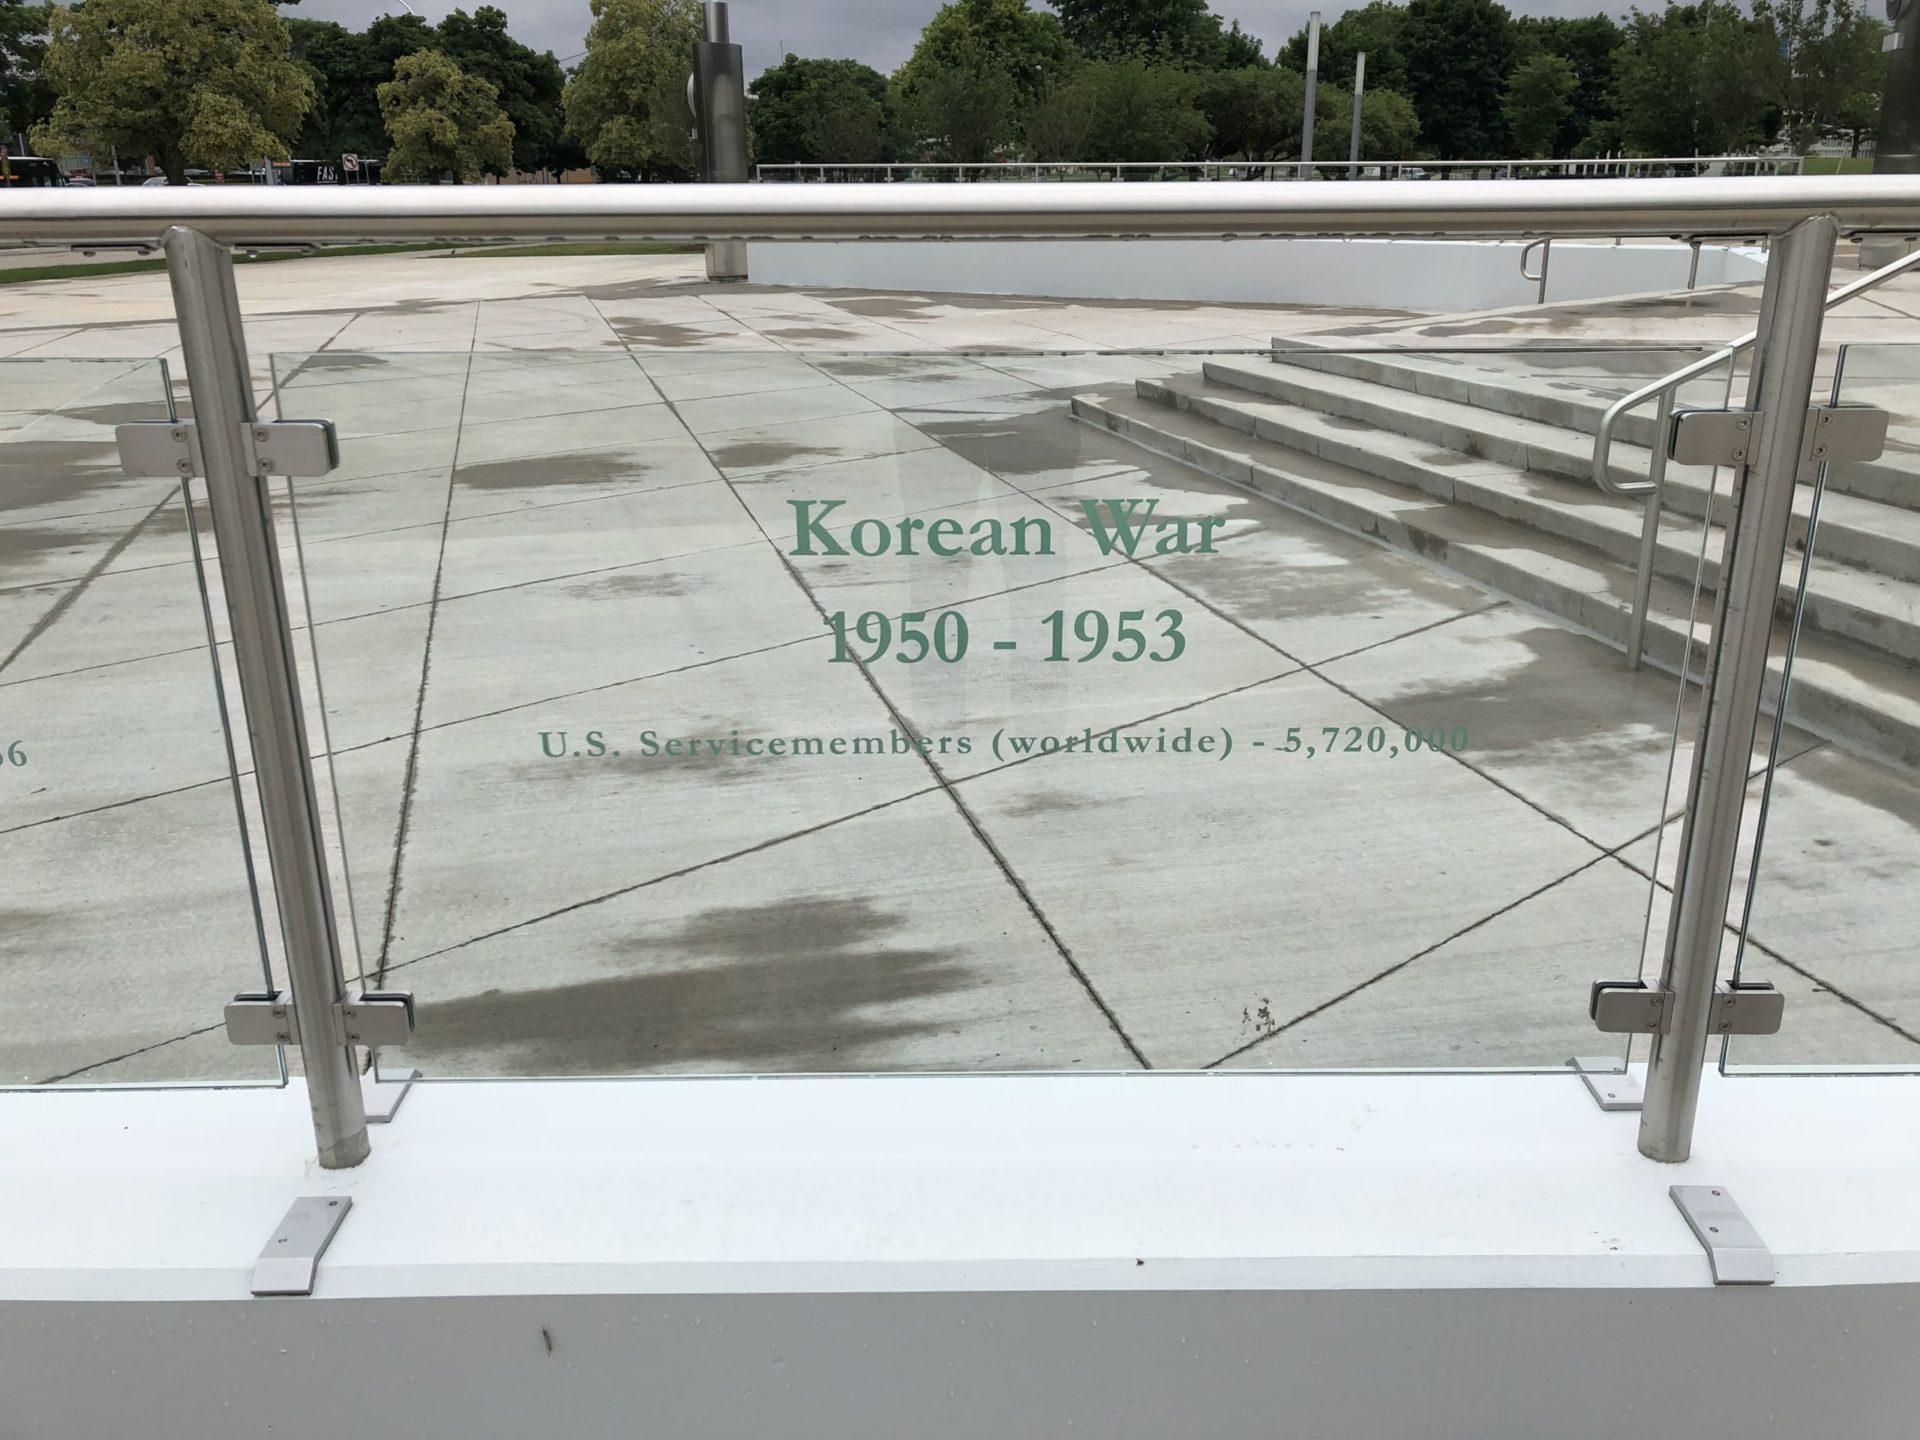 Korean War Memorials - Detroit